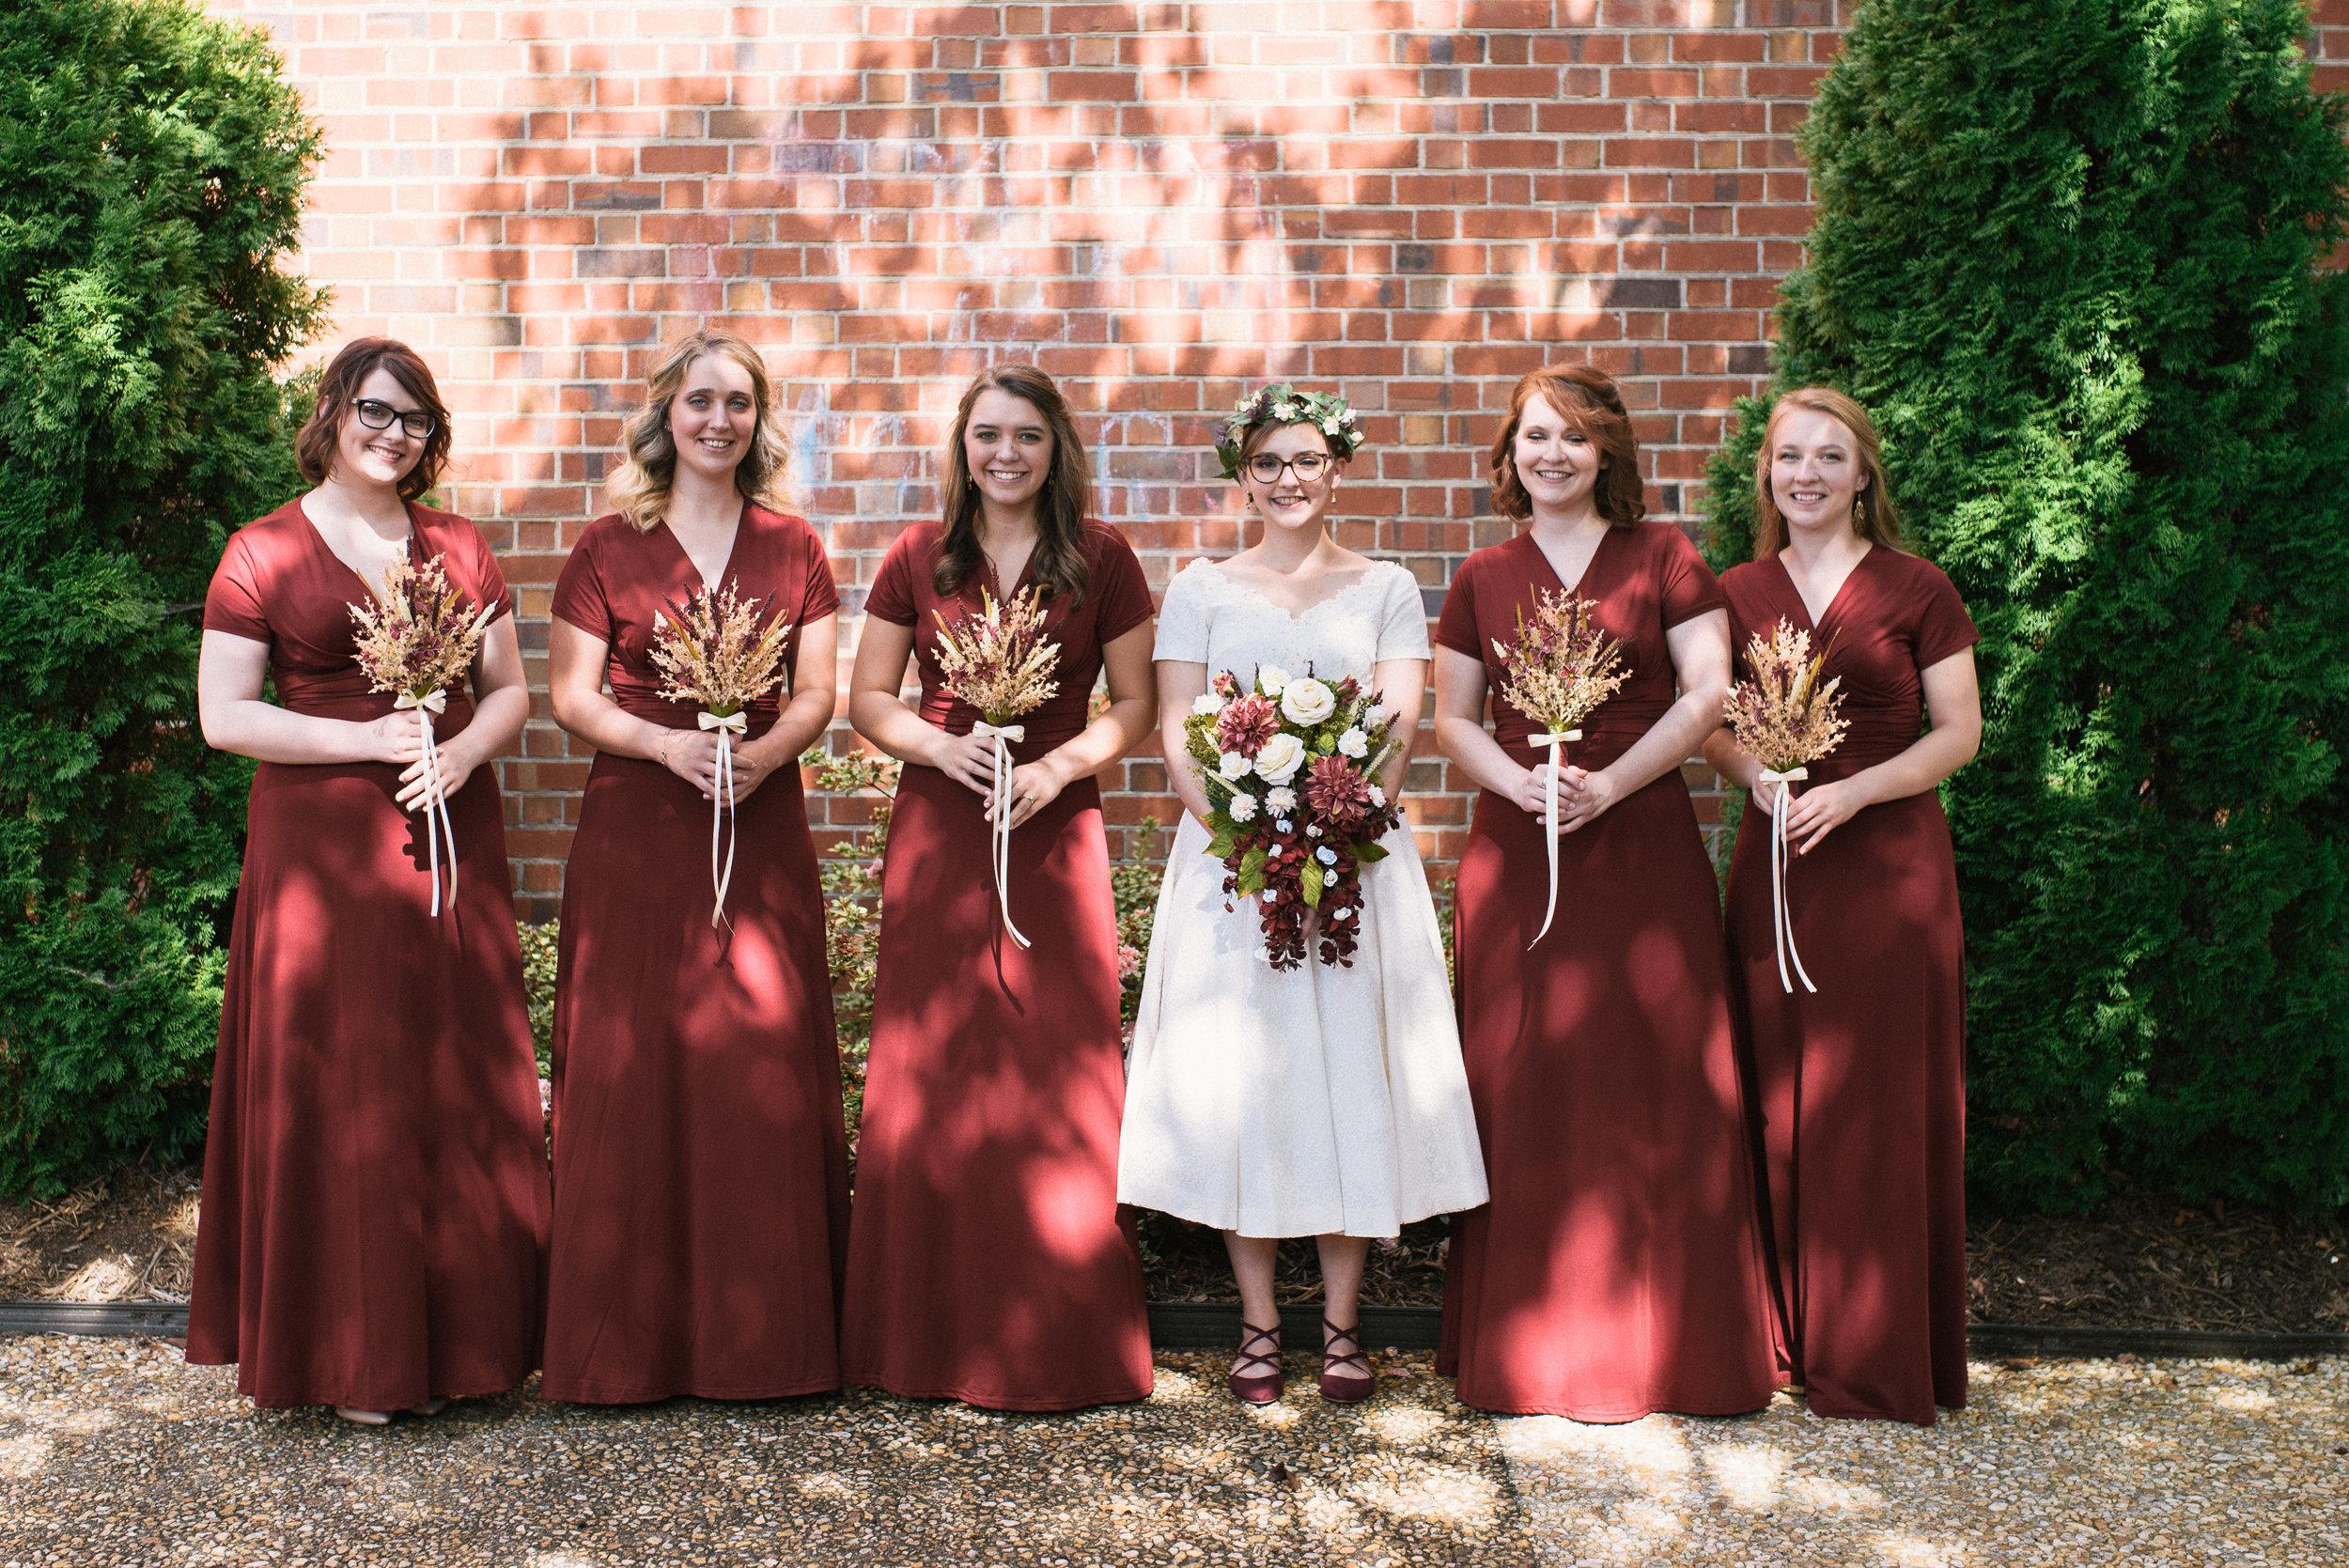 Wake Forest Wedding Photographer - North Carolina Wedding Photographer - New England Wedding Photographer - Boston Wedding Photographer